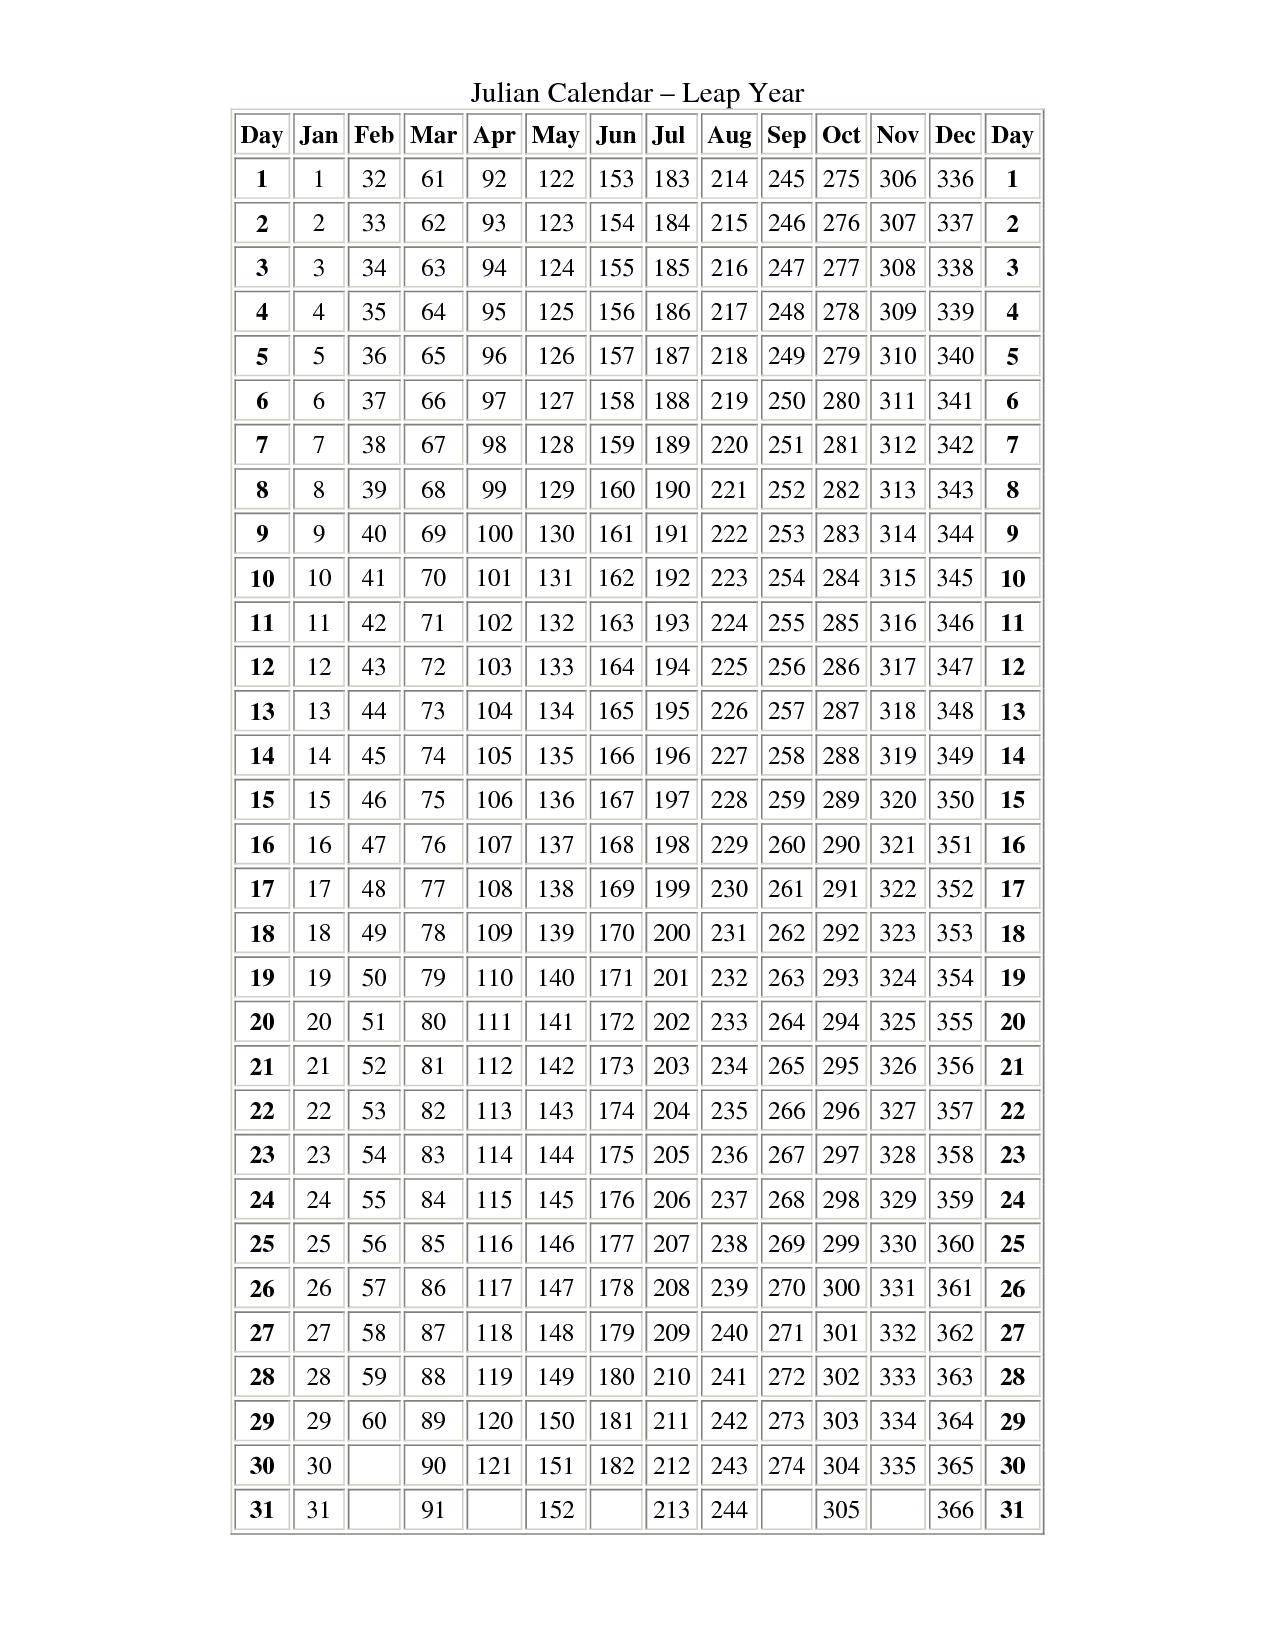 Julian Code Calculator Leap Year Printable :-Free Calendar Template